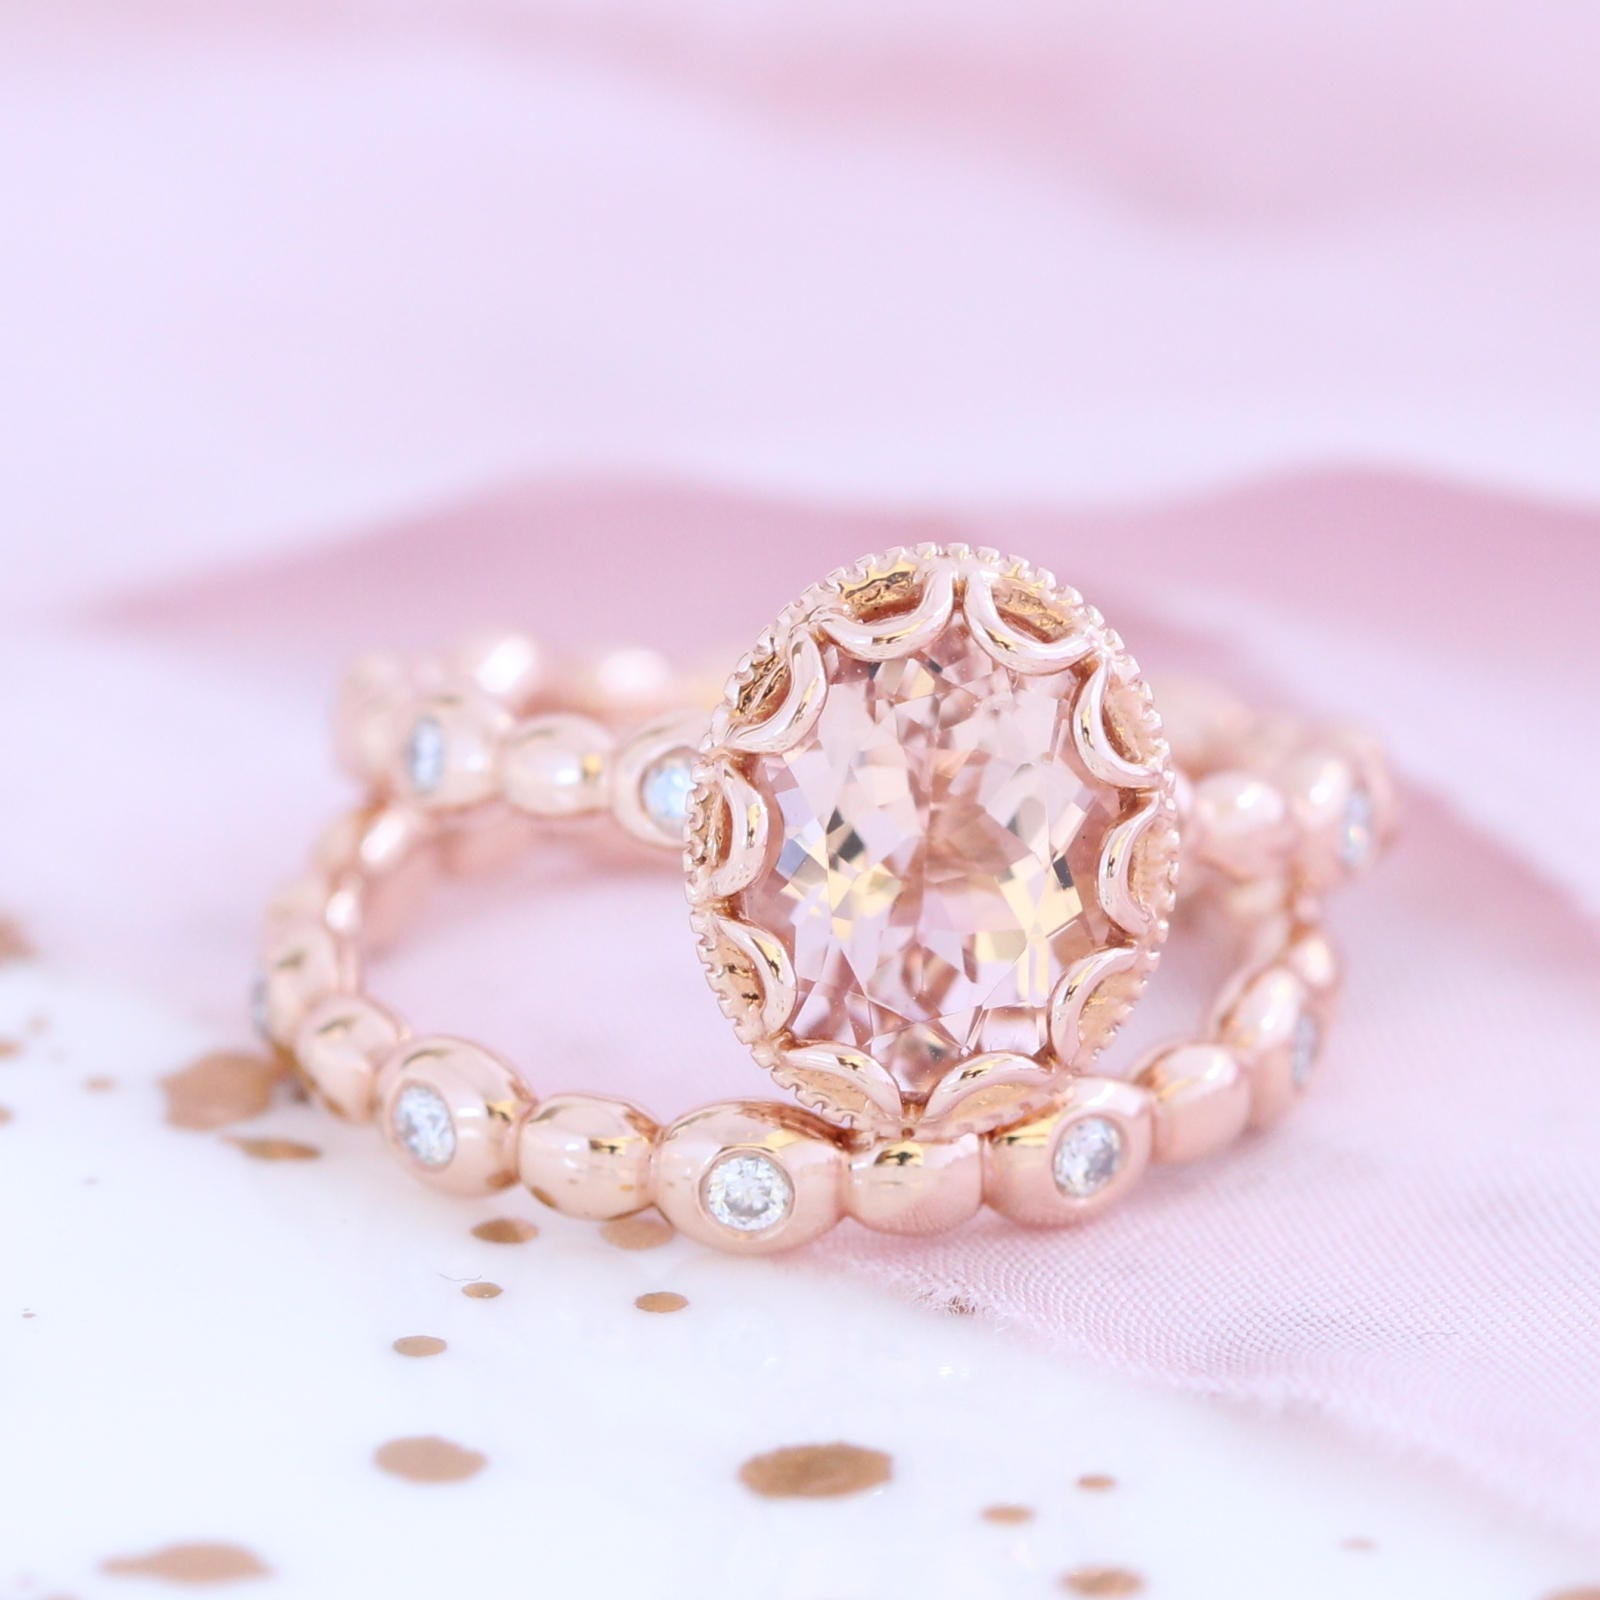 Oval Morganite Engagement Ring Bridal Set in 14k Rose Gold